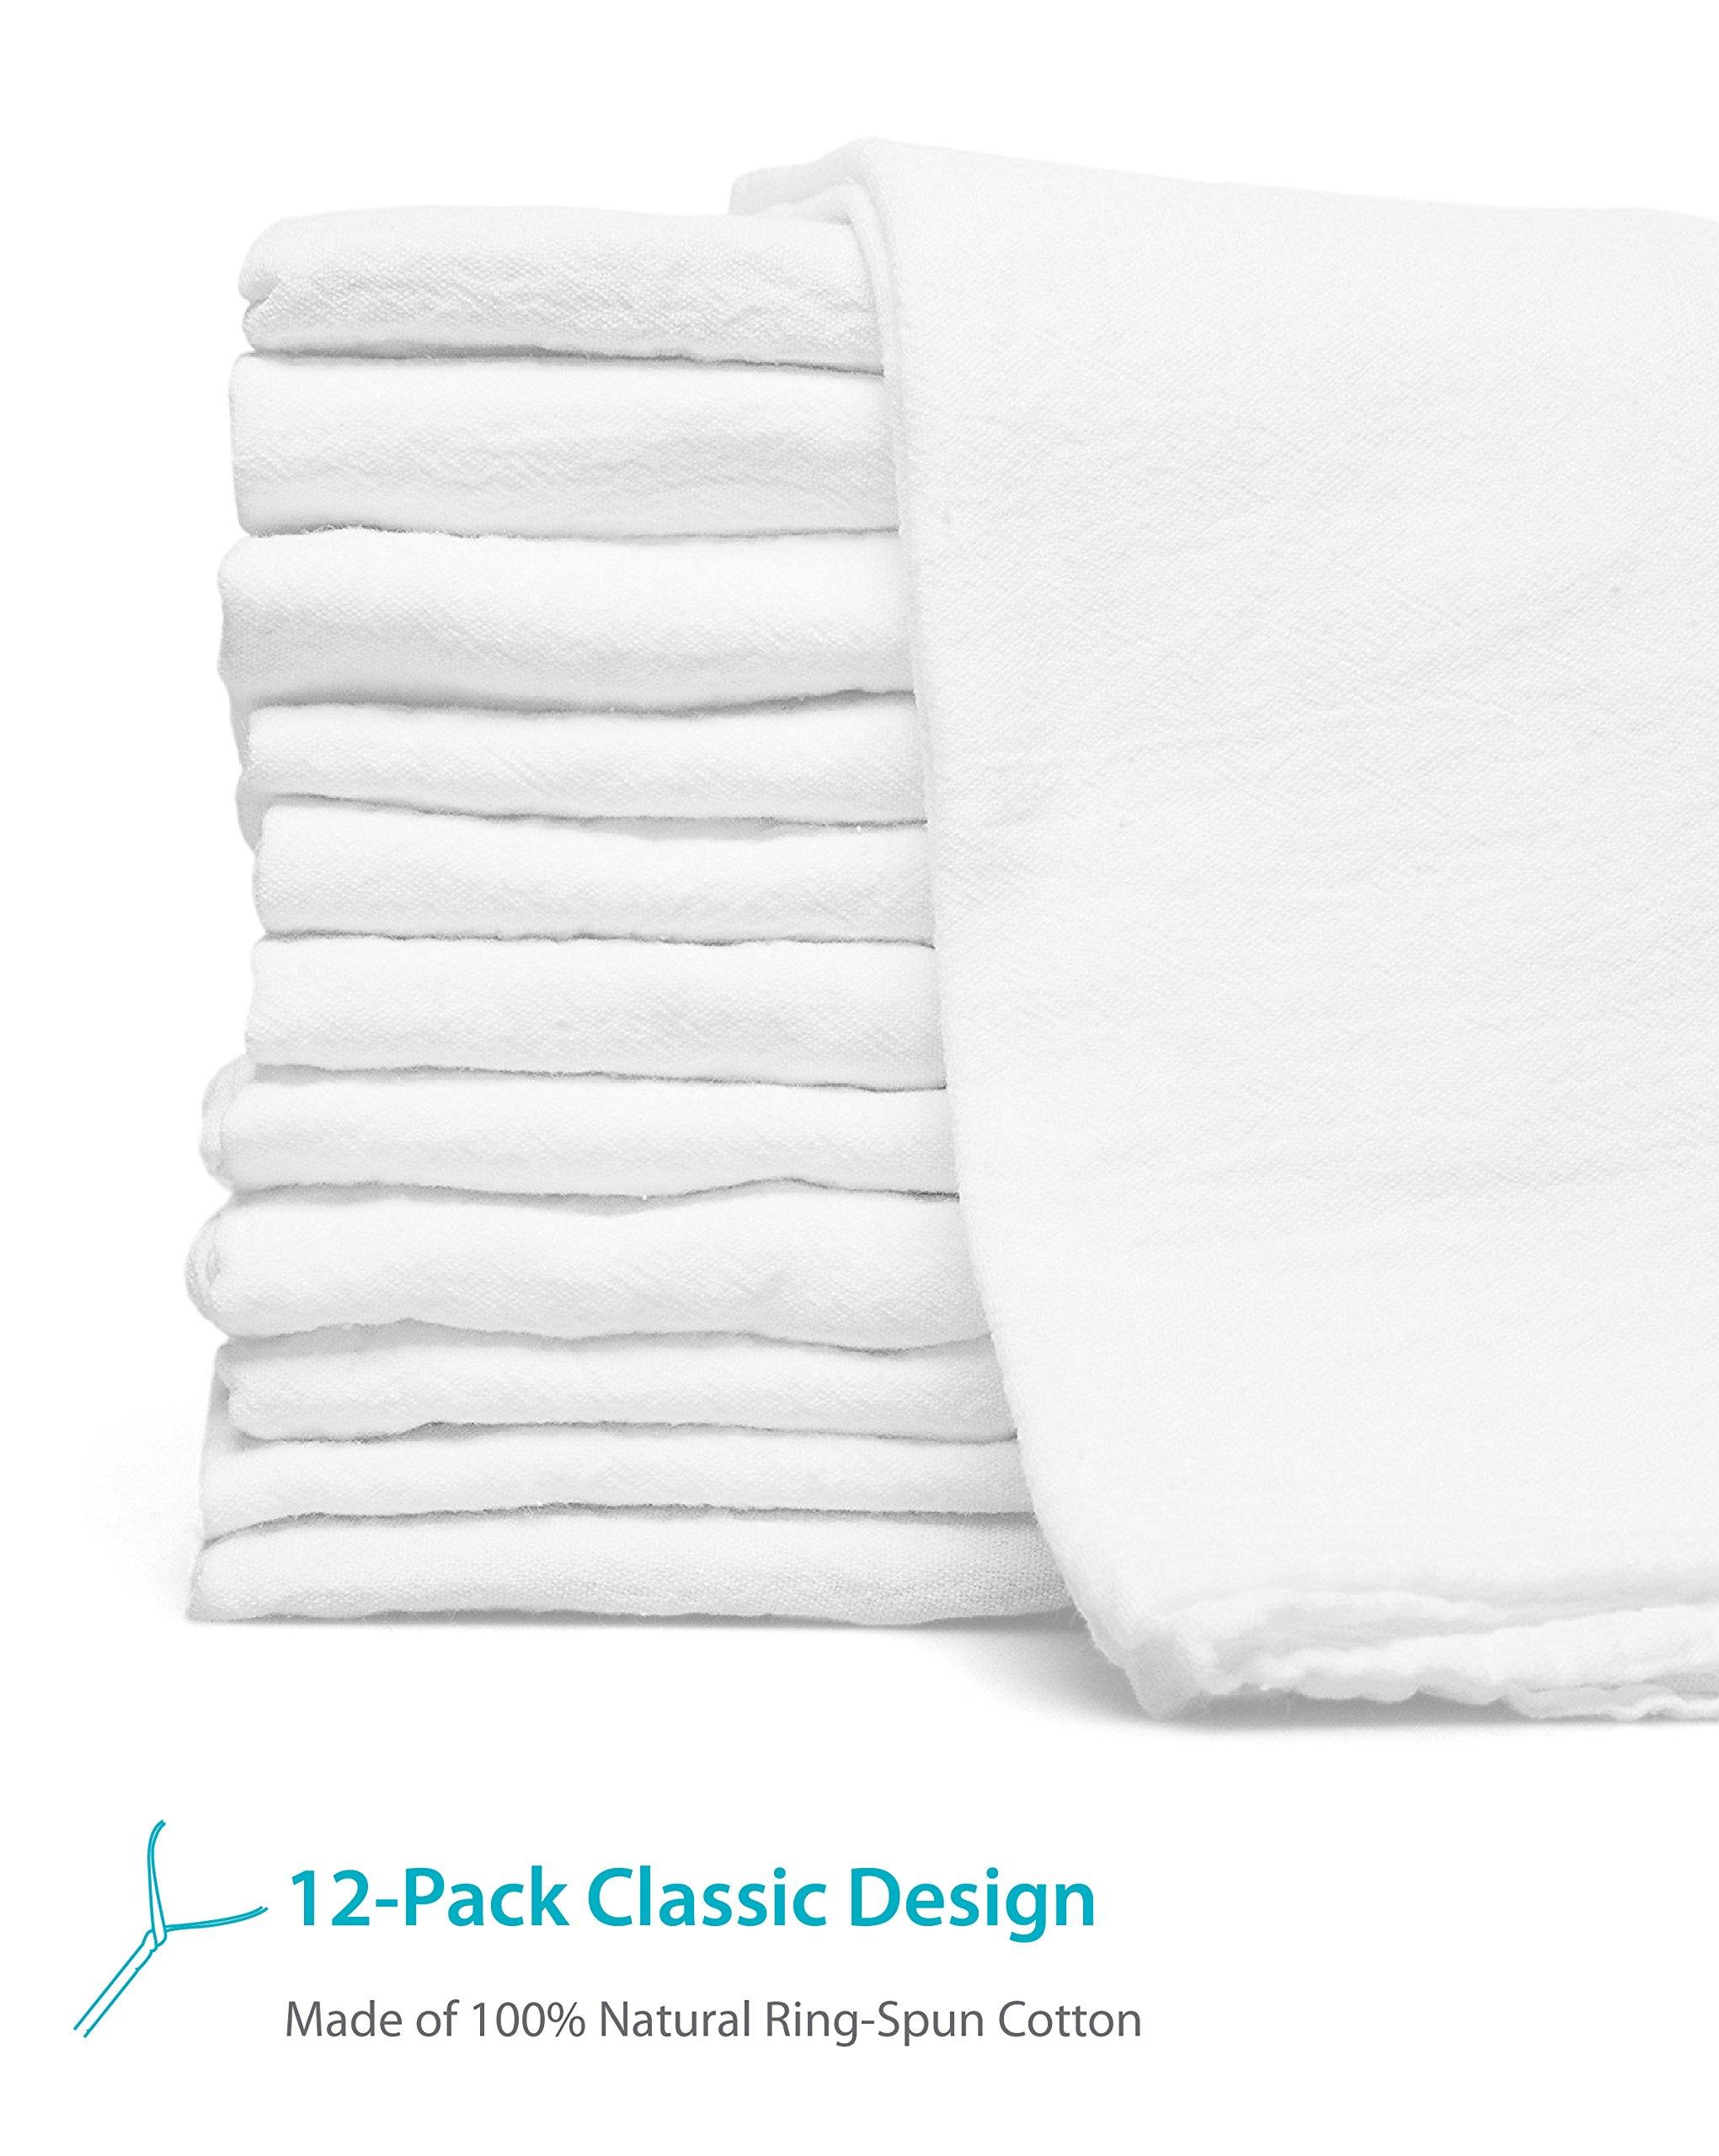 Zeppoli 12-Pack Flour Sack Towels - 31'' x 31'' Kitchen Towels - Absorbent White Dish Towels - 100% Ring Spun Cotton Bar Towels by Zeppoli (Image #2)